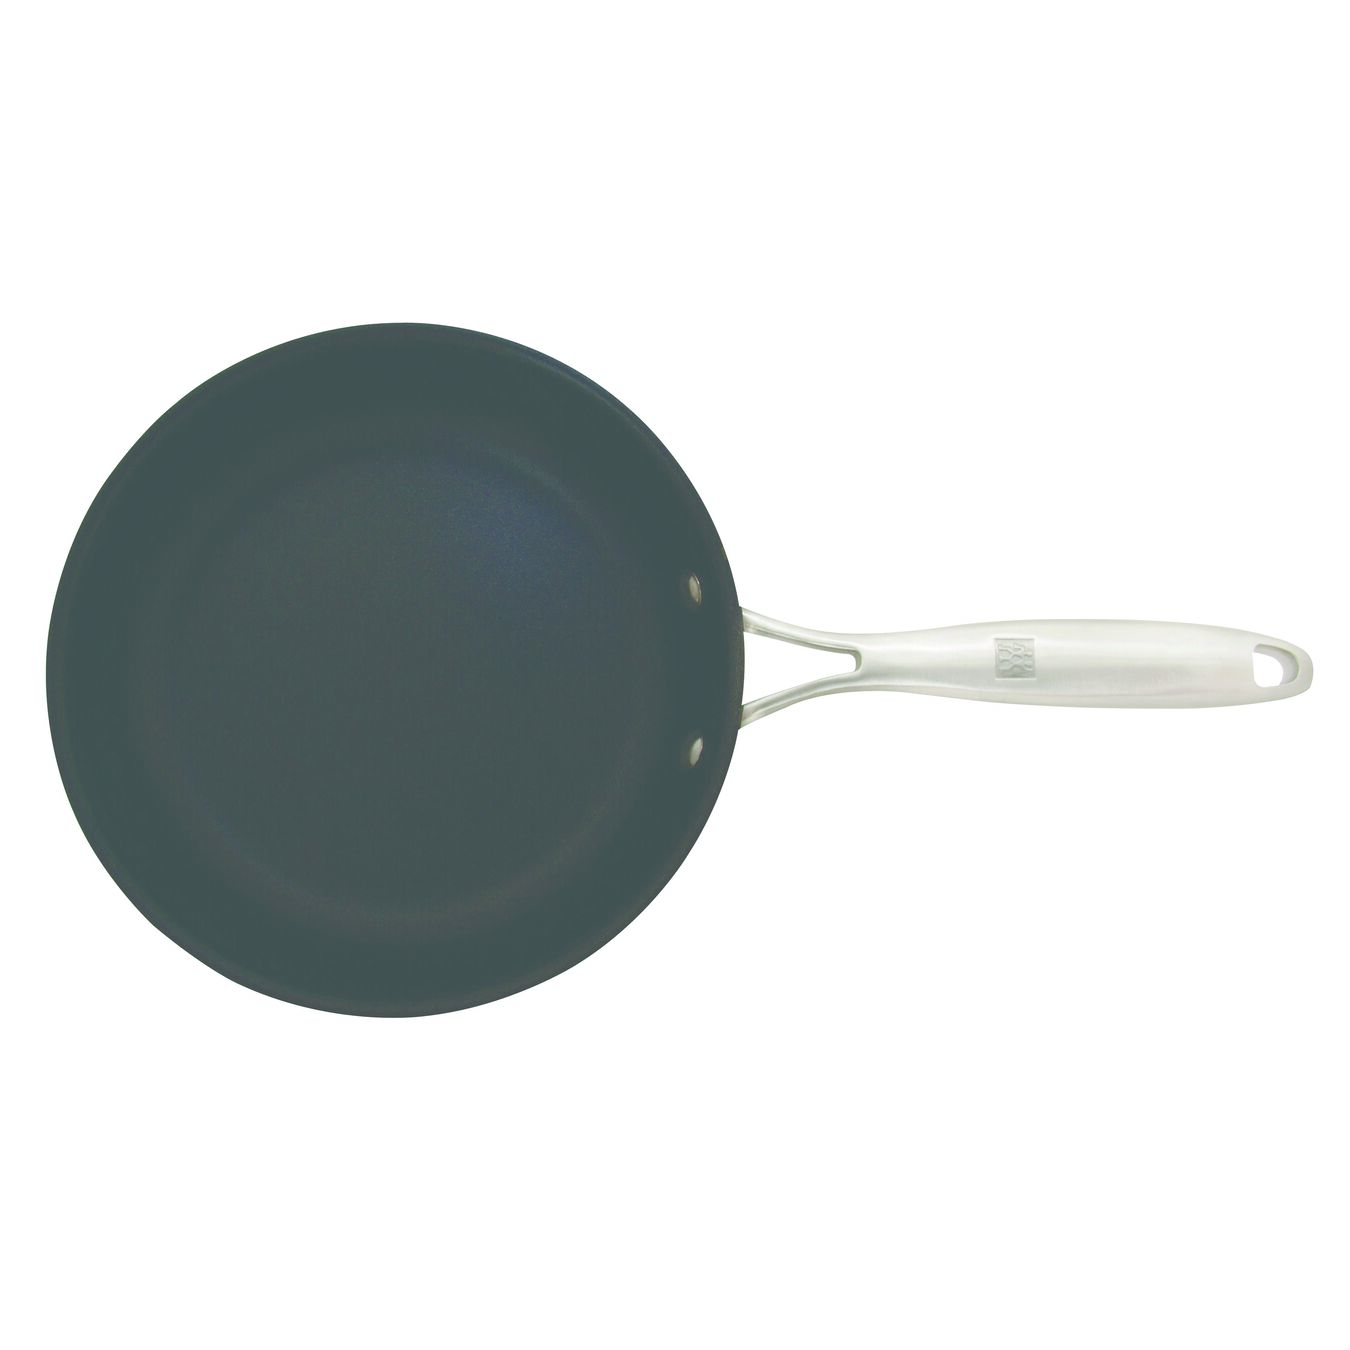 32 cm / 12.5 inch Frying pan,,large 2